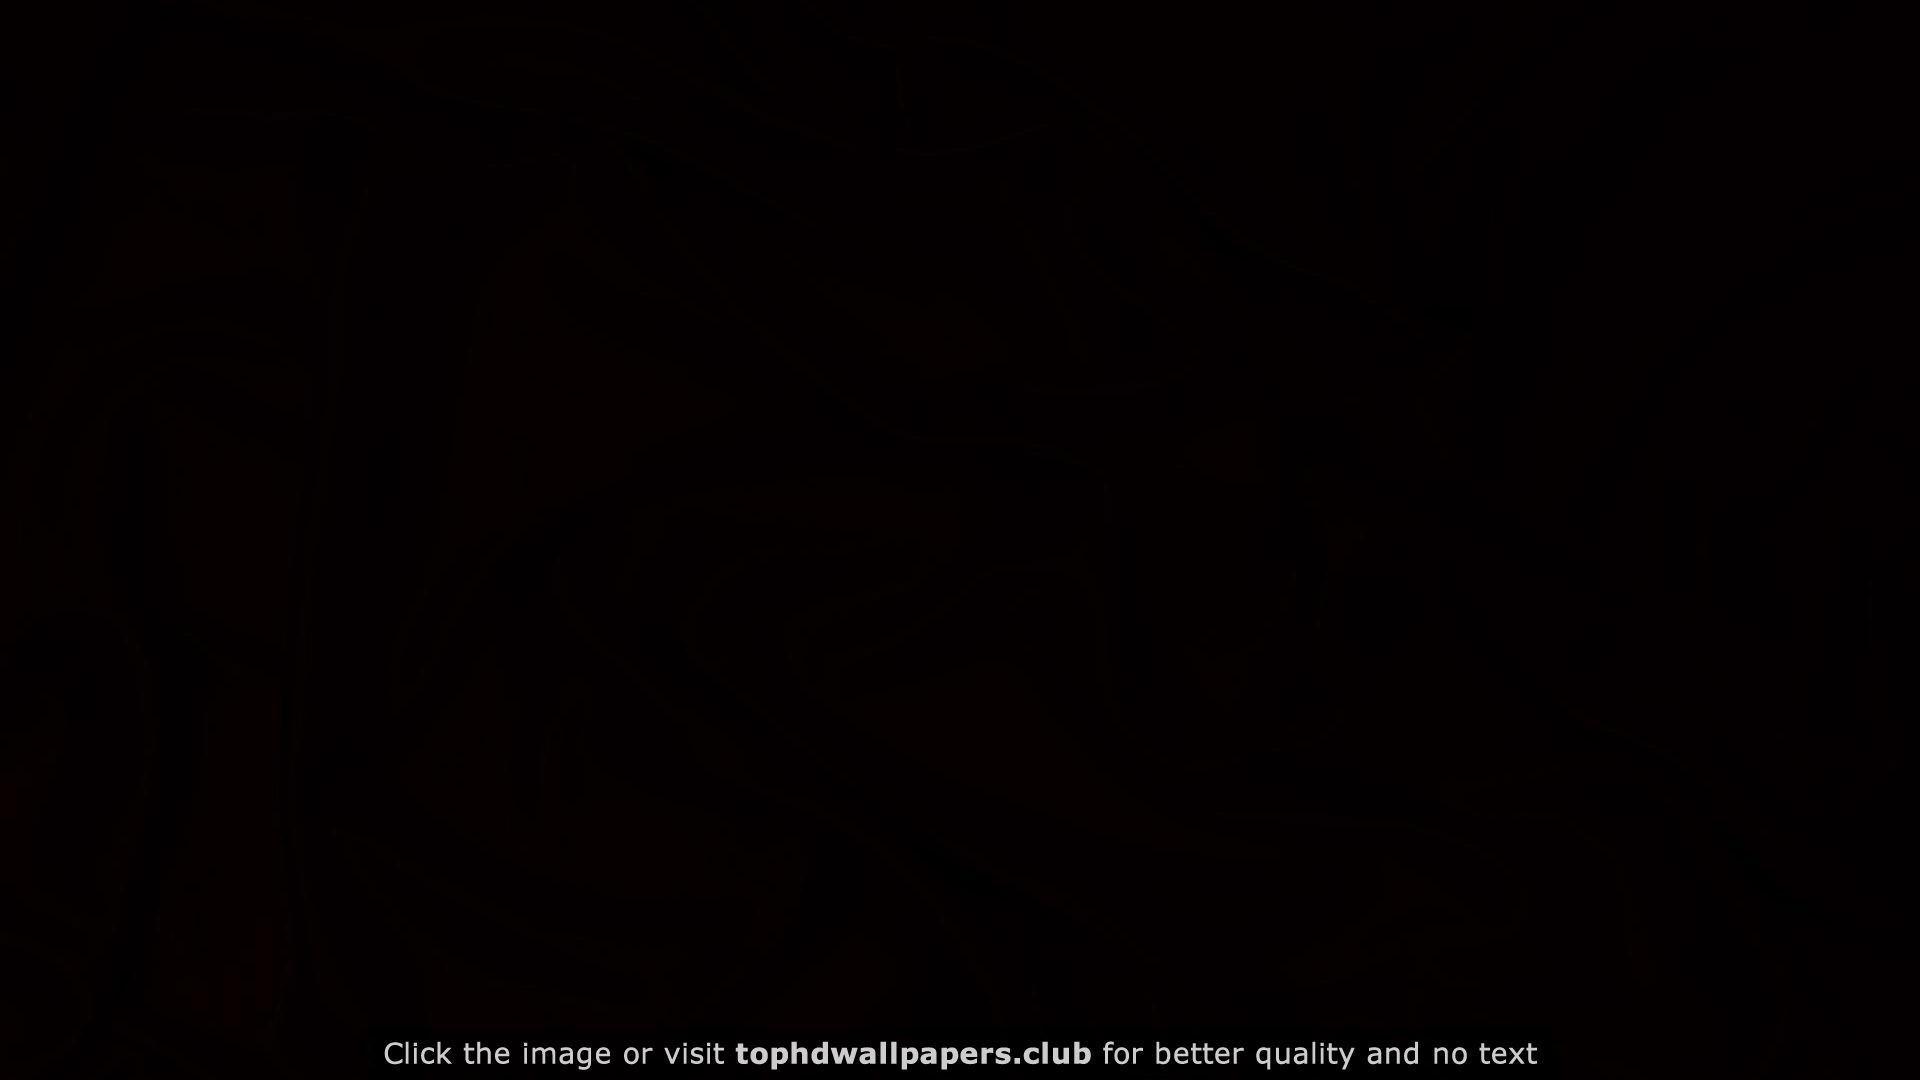 S Black Cool Windows Desktop Dark 4K or HD wallpaper for your PC .